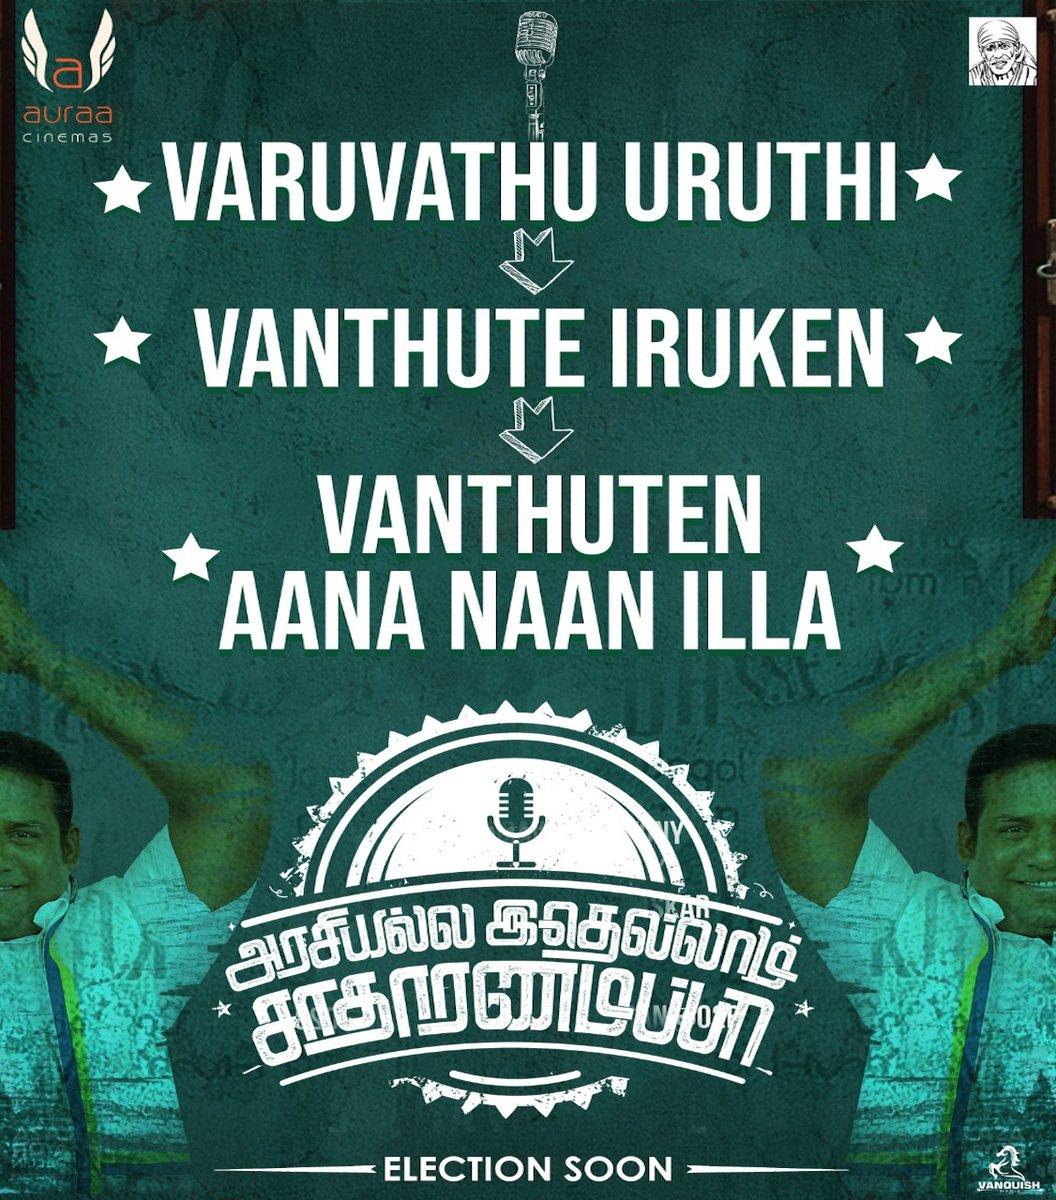 #AISTheMovie - Coming Soon In Theatres. Get ready for #RoboShankar 's Politics Entry Atrocities in #Arasiyallaidhellamsadharnamappa  !!   #Veera #Pasupathi #MalavikaNair @Avinaash_Offi @auraacinemas https://t.co/Xq5U5wqXJ8